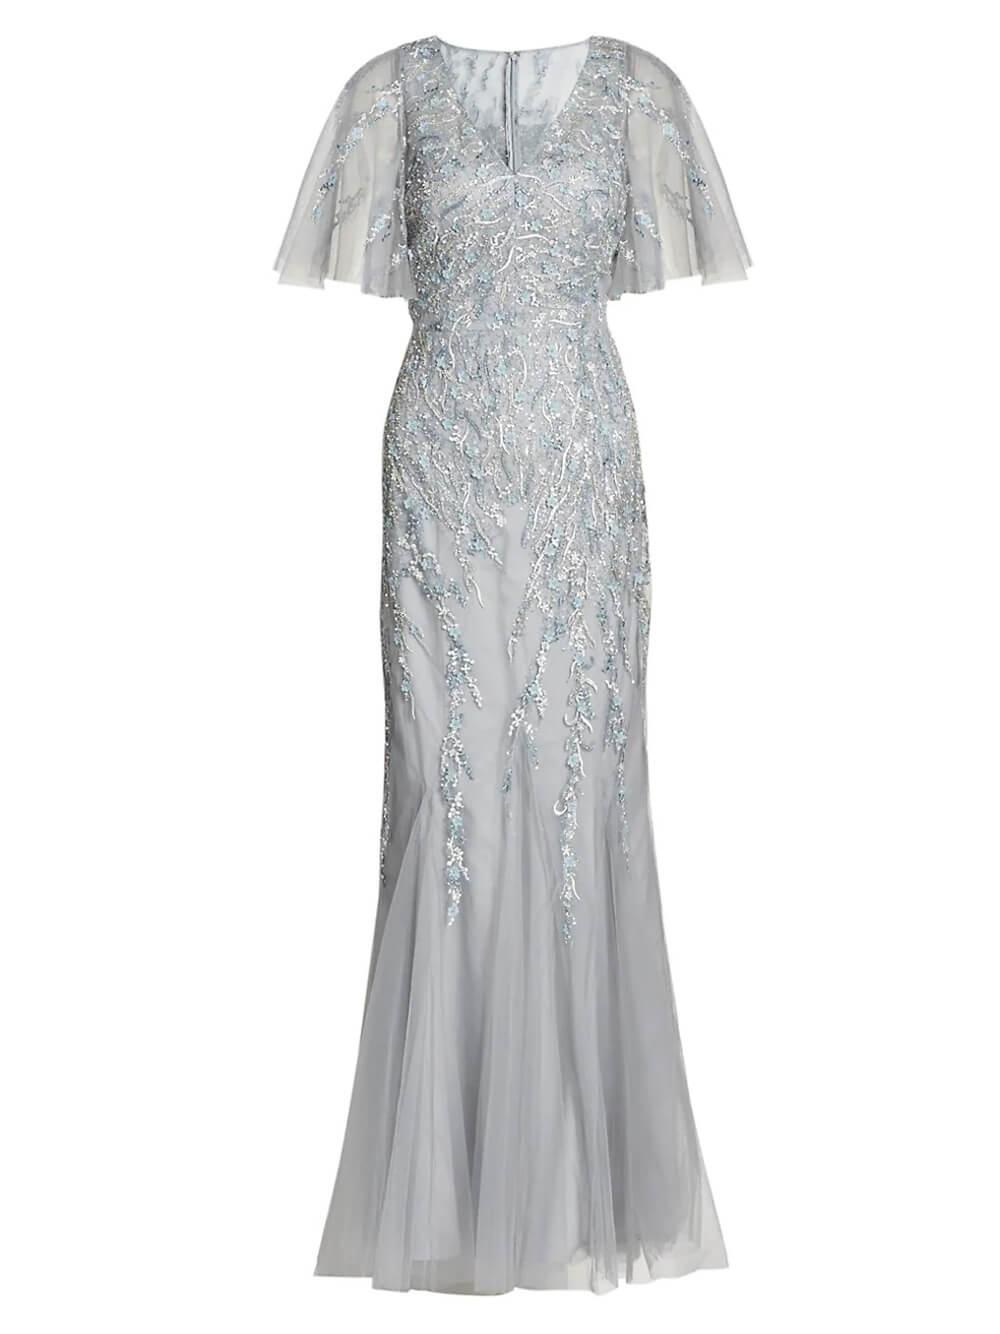 Flutter Sleeve Beaded Gown Item # 219010-S21